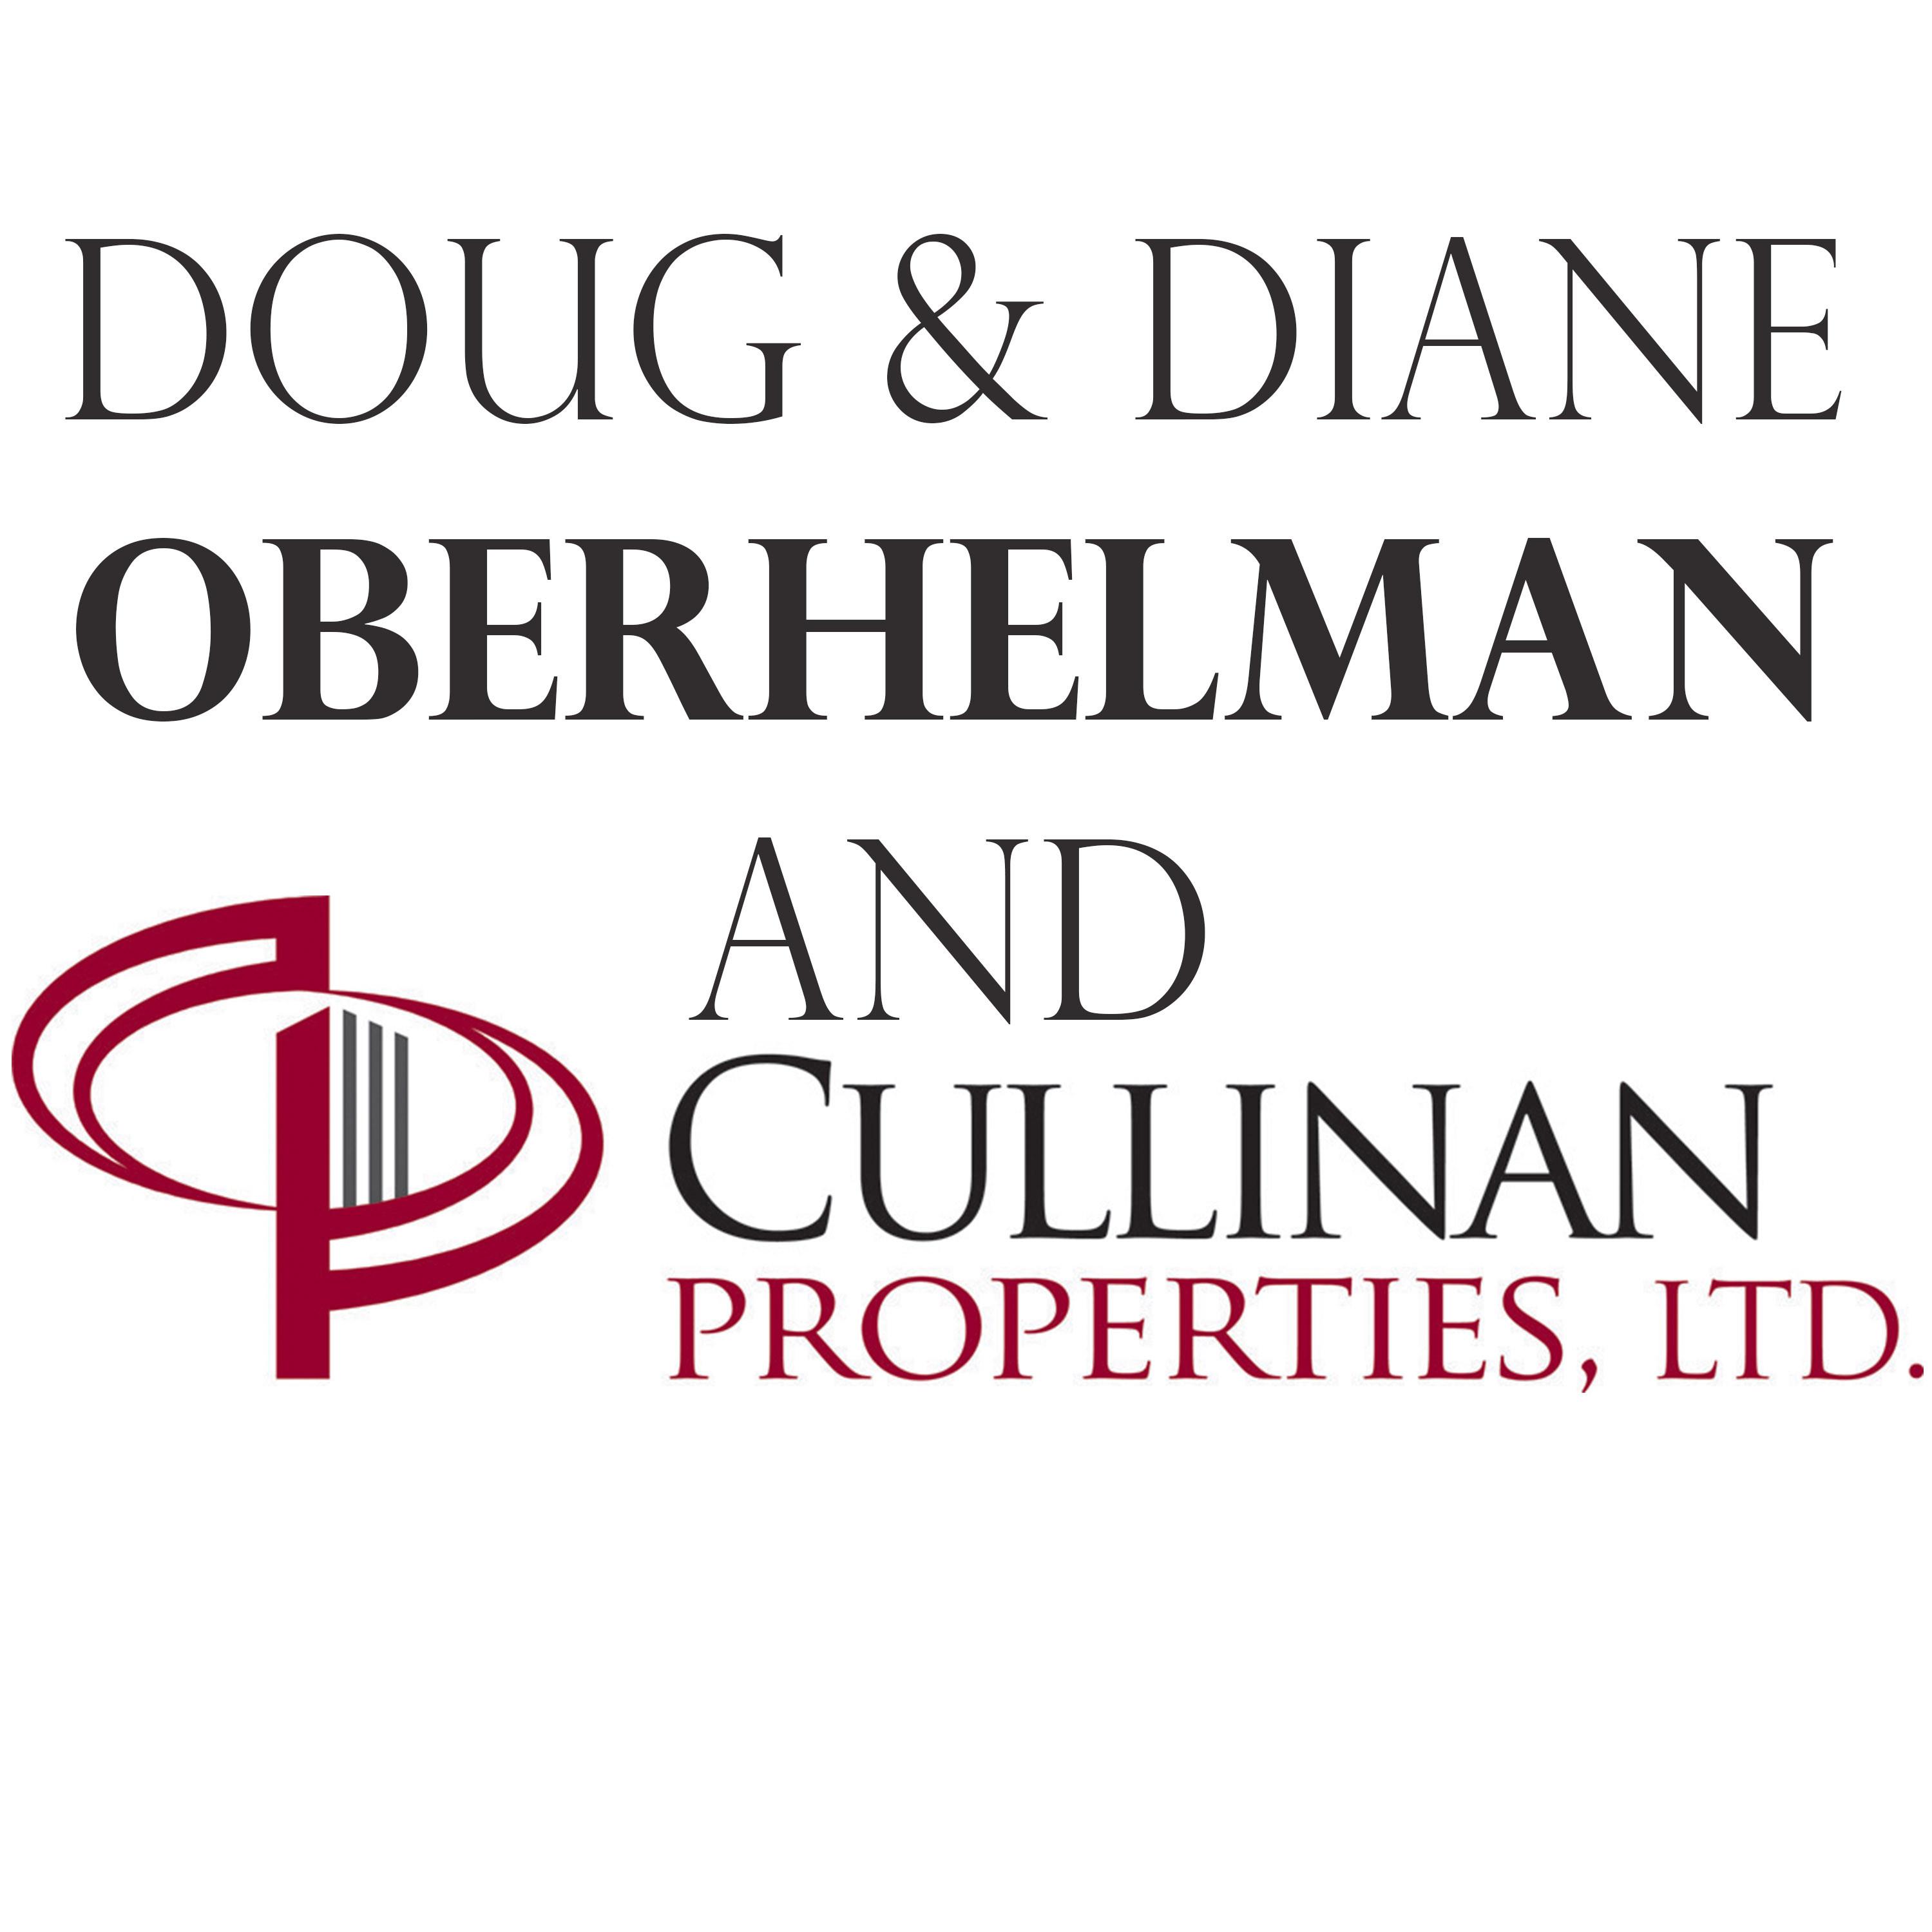 Doug & Diane Oberhelman/Cullinan Properties